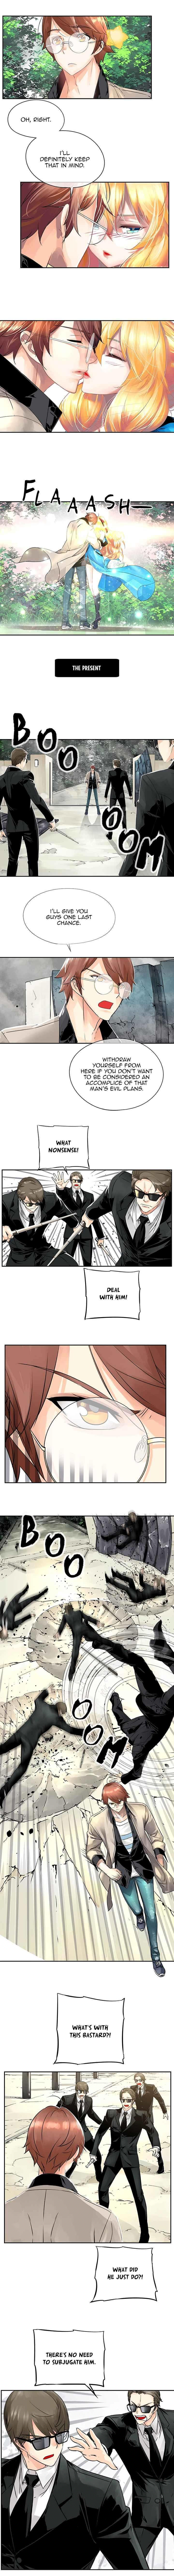 "The God Of ""Game Of God"" Chapter 35 page 5 - Mangakakalot"